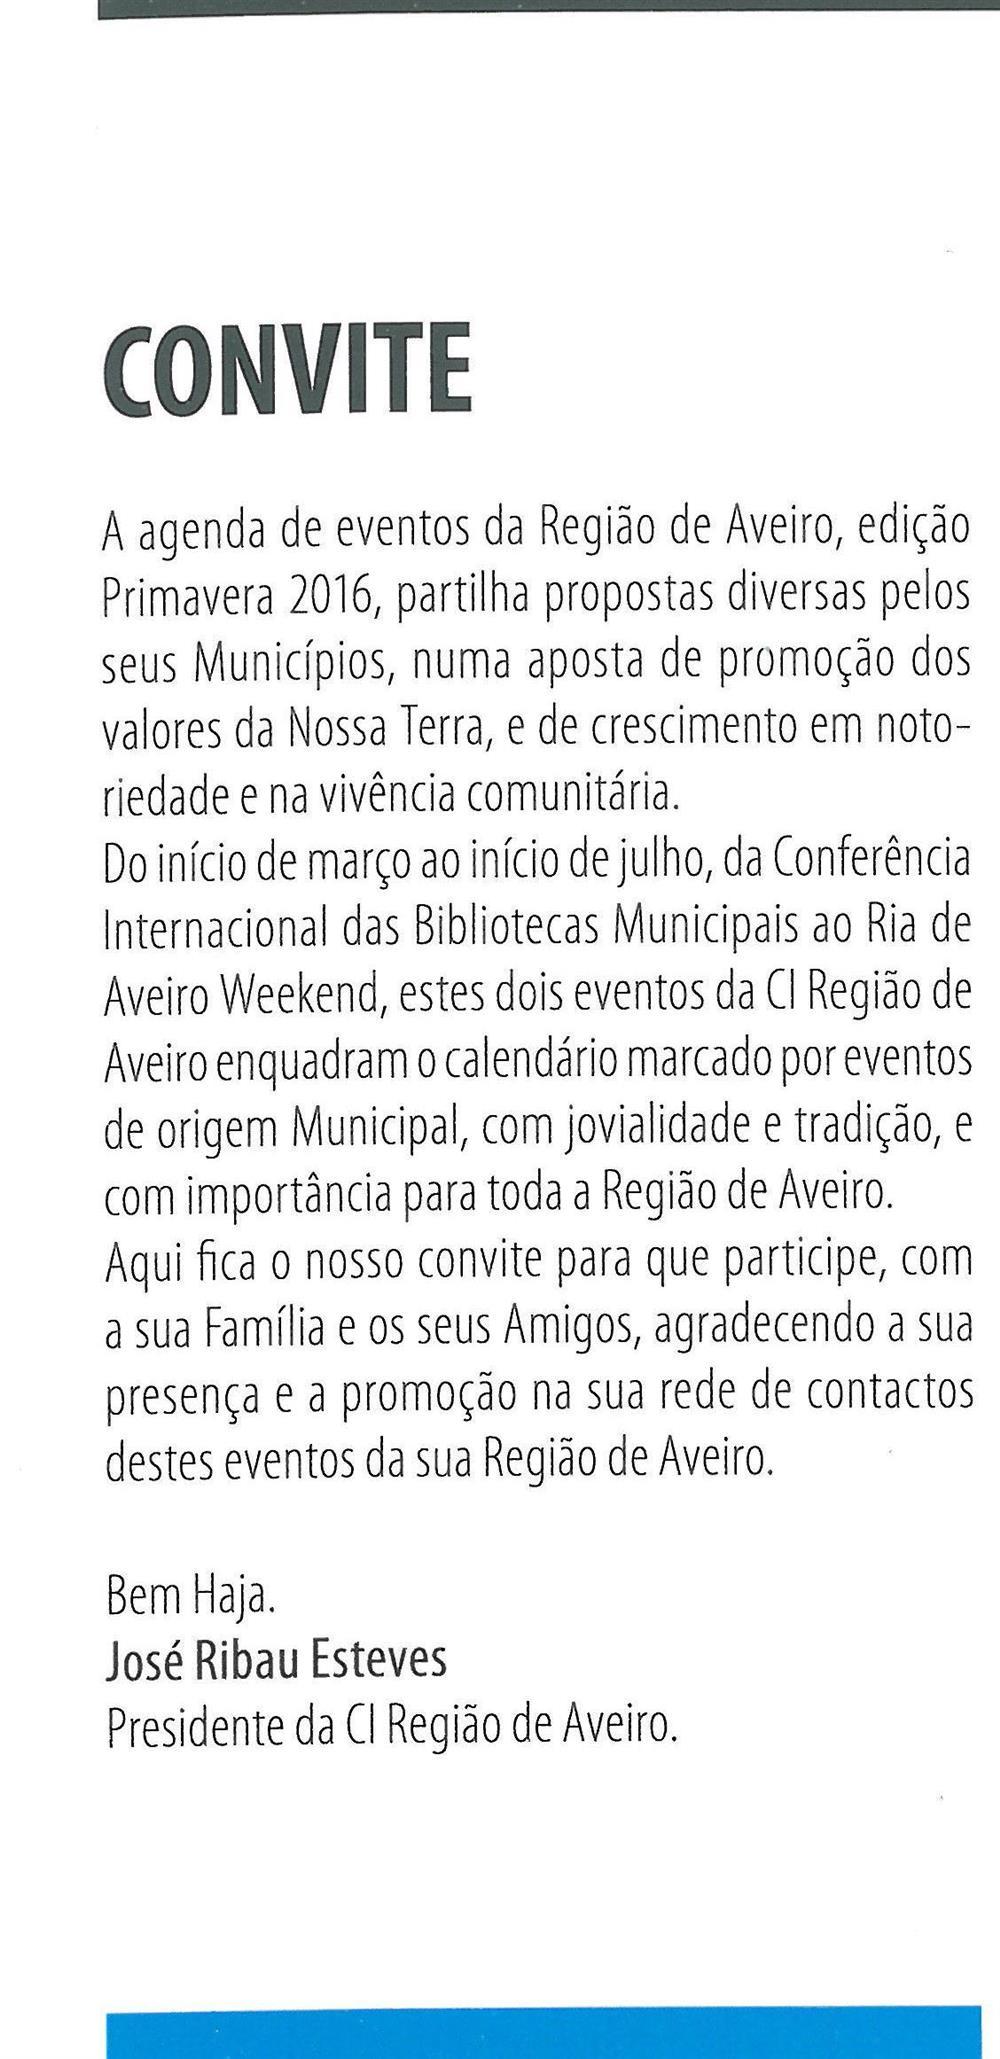 RA:Agenda-mar.'16-p.1-Convite.jpg